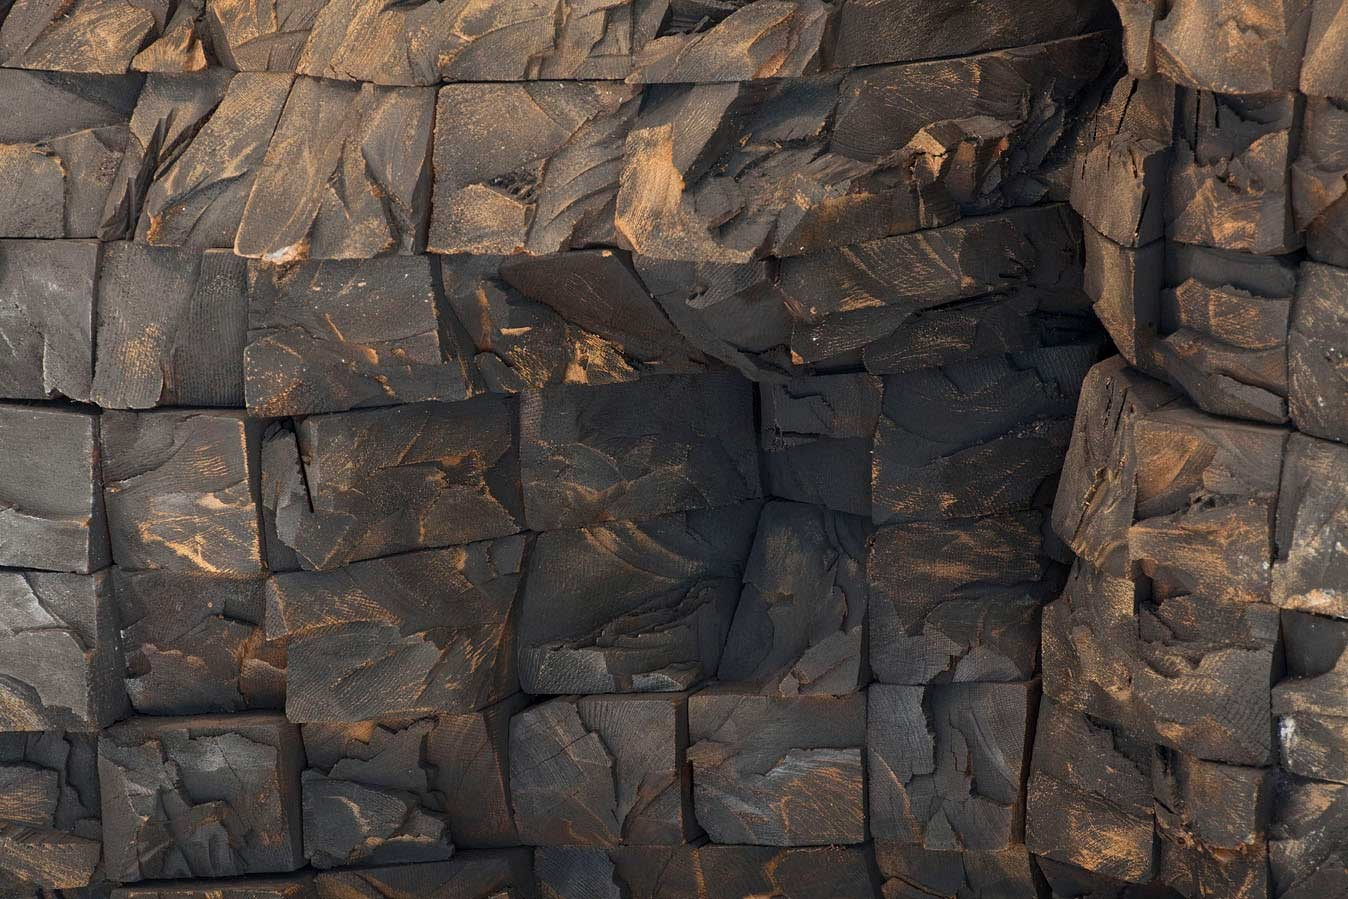 Petrified blocks of wood